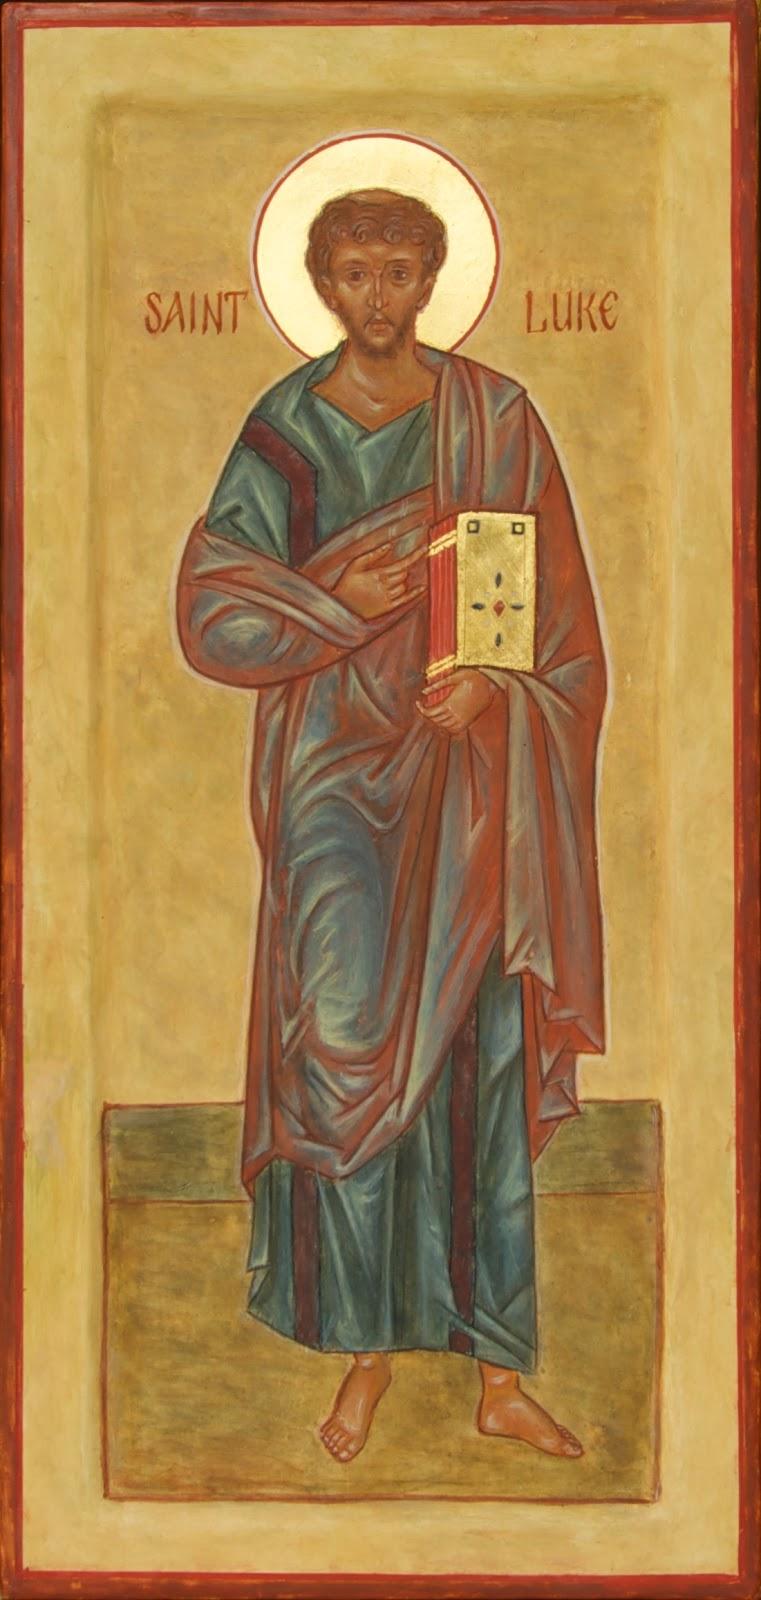 Feast of Saint Luke